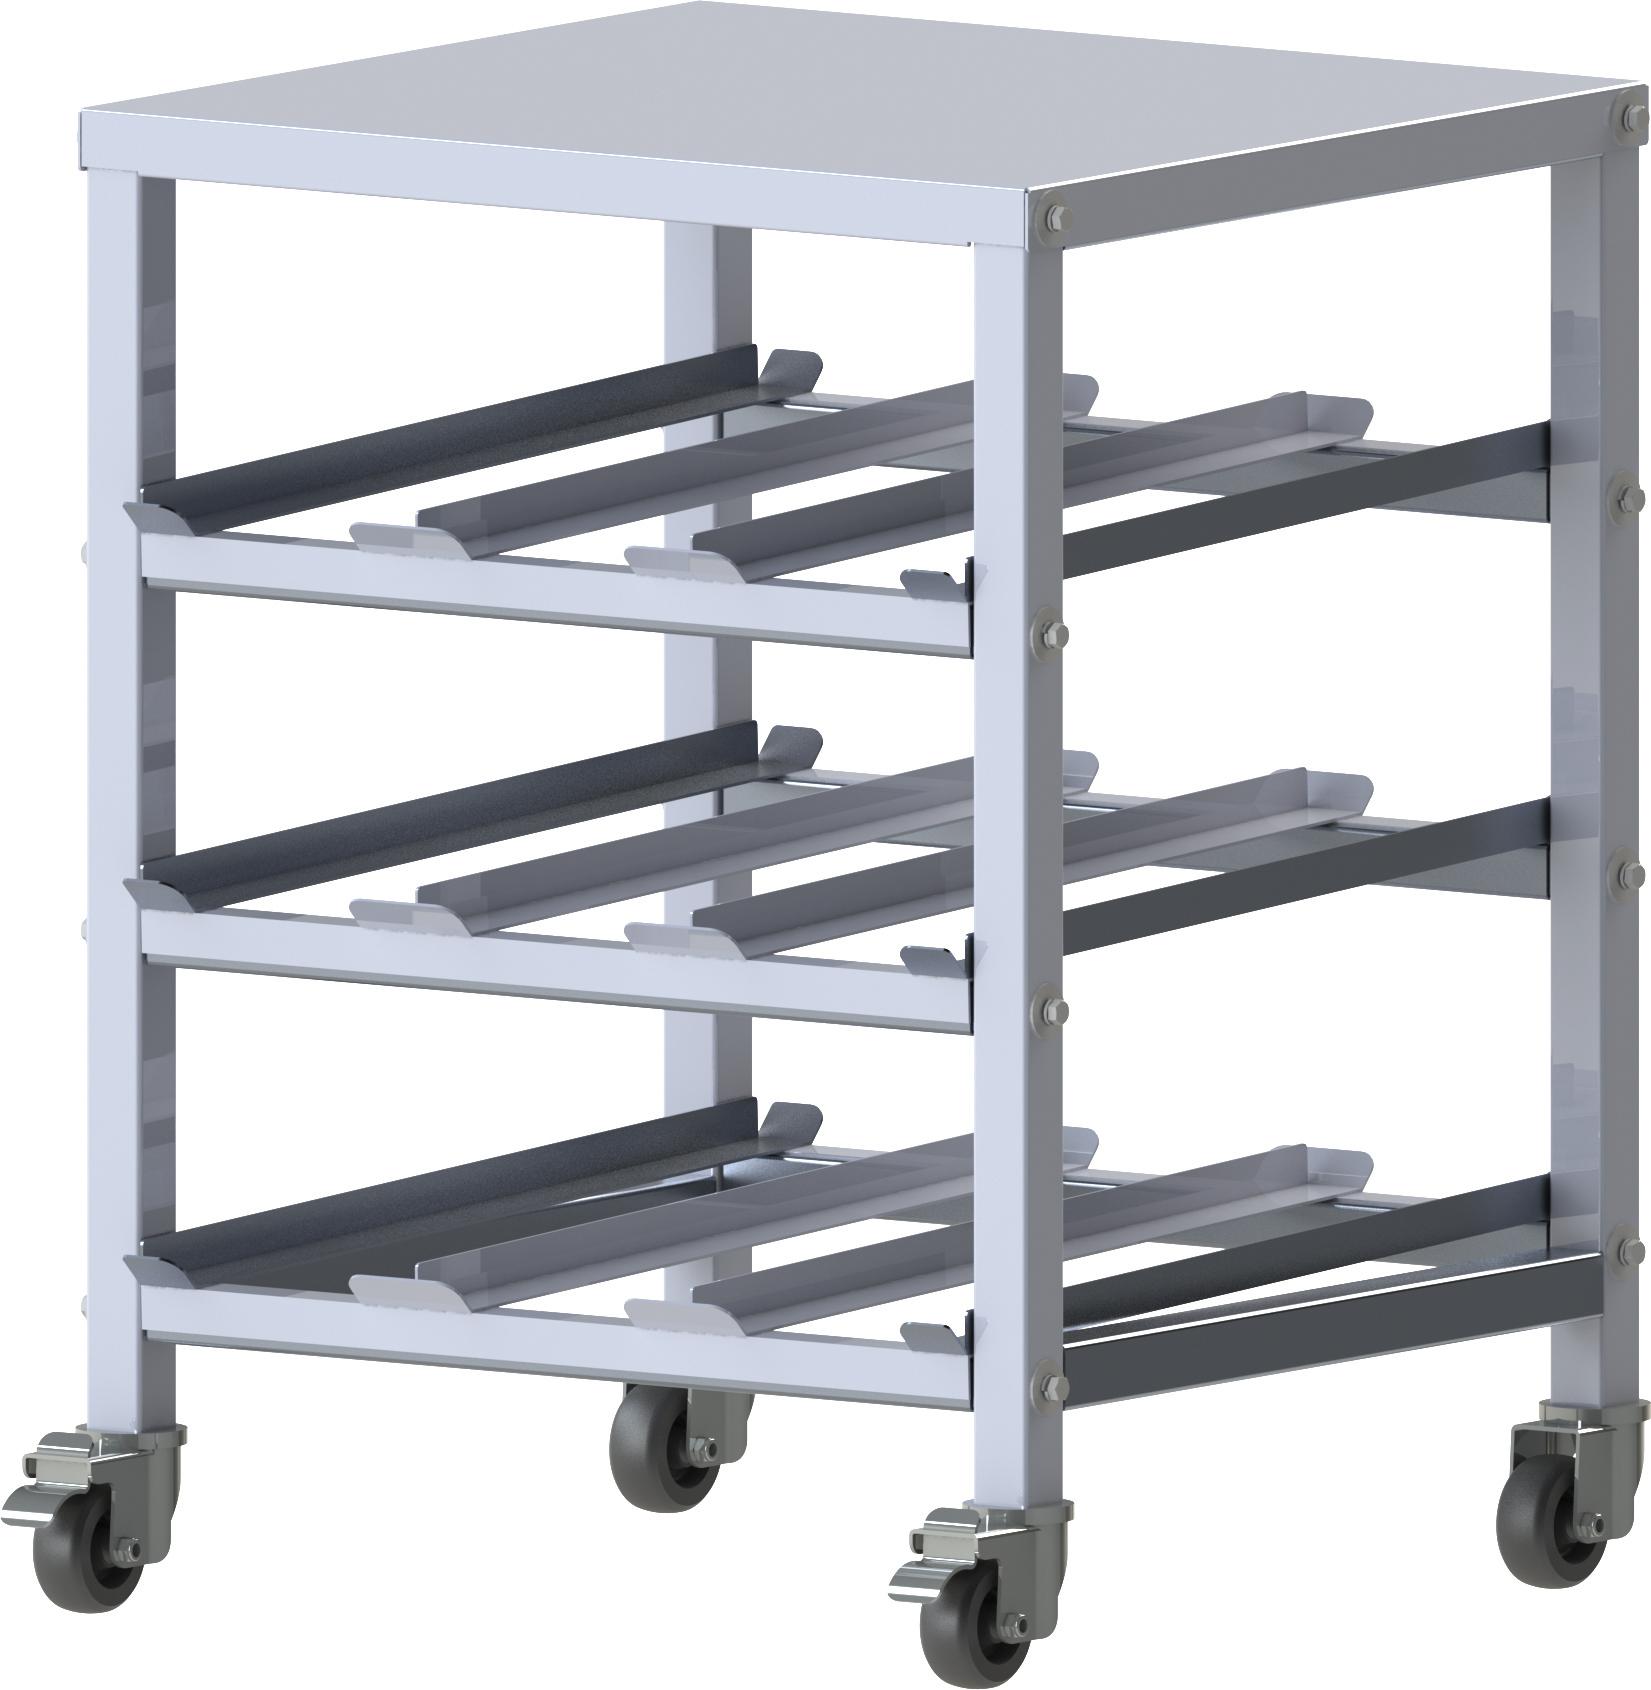 Winco ALCR-3M can storage rack